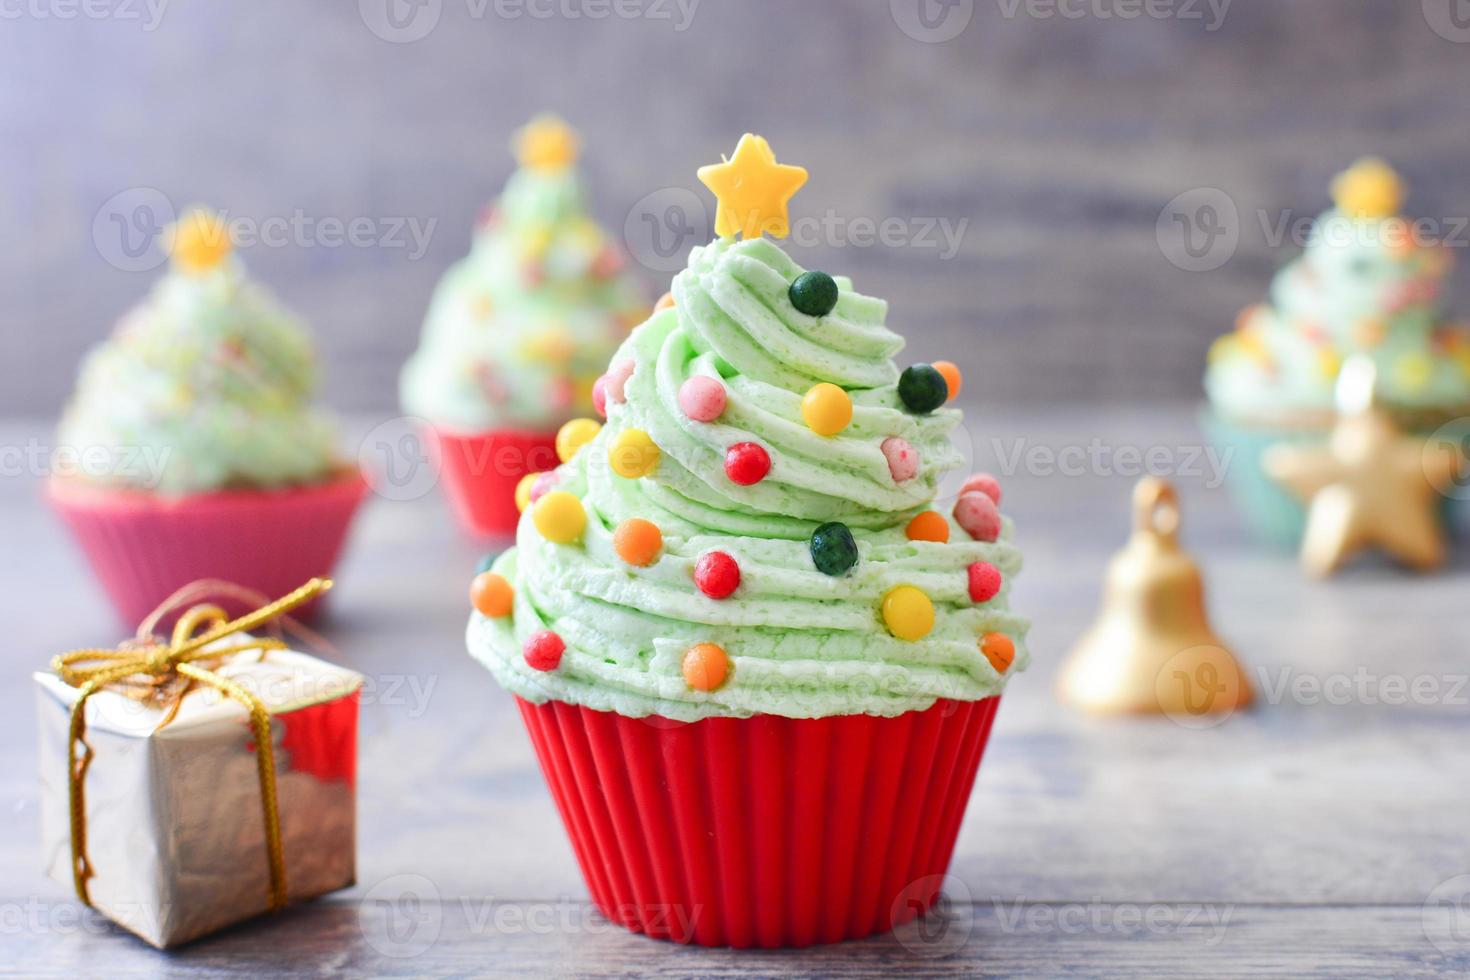 muffins med julgranform foto